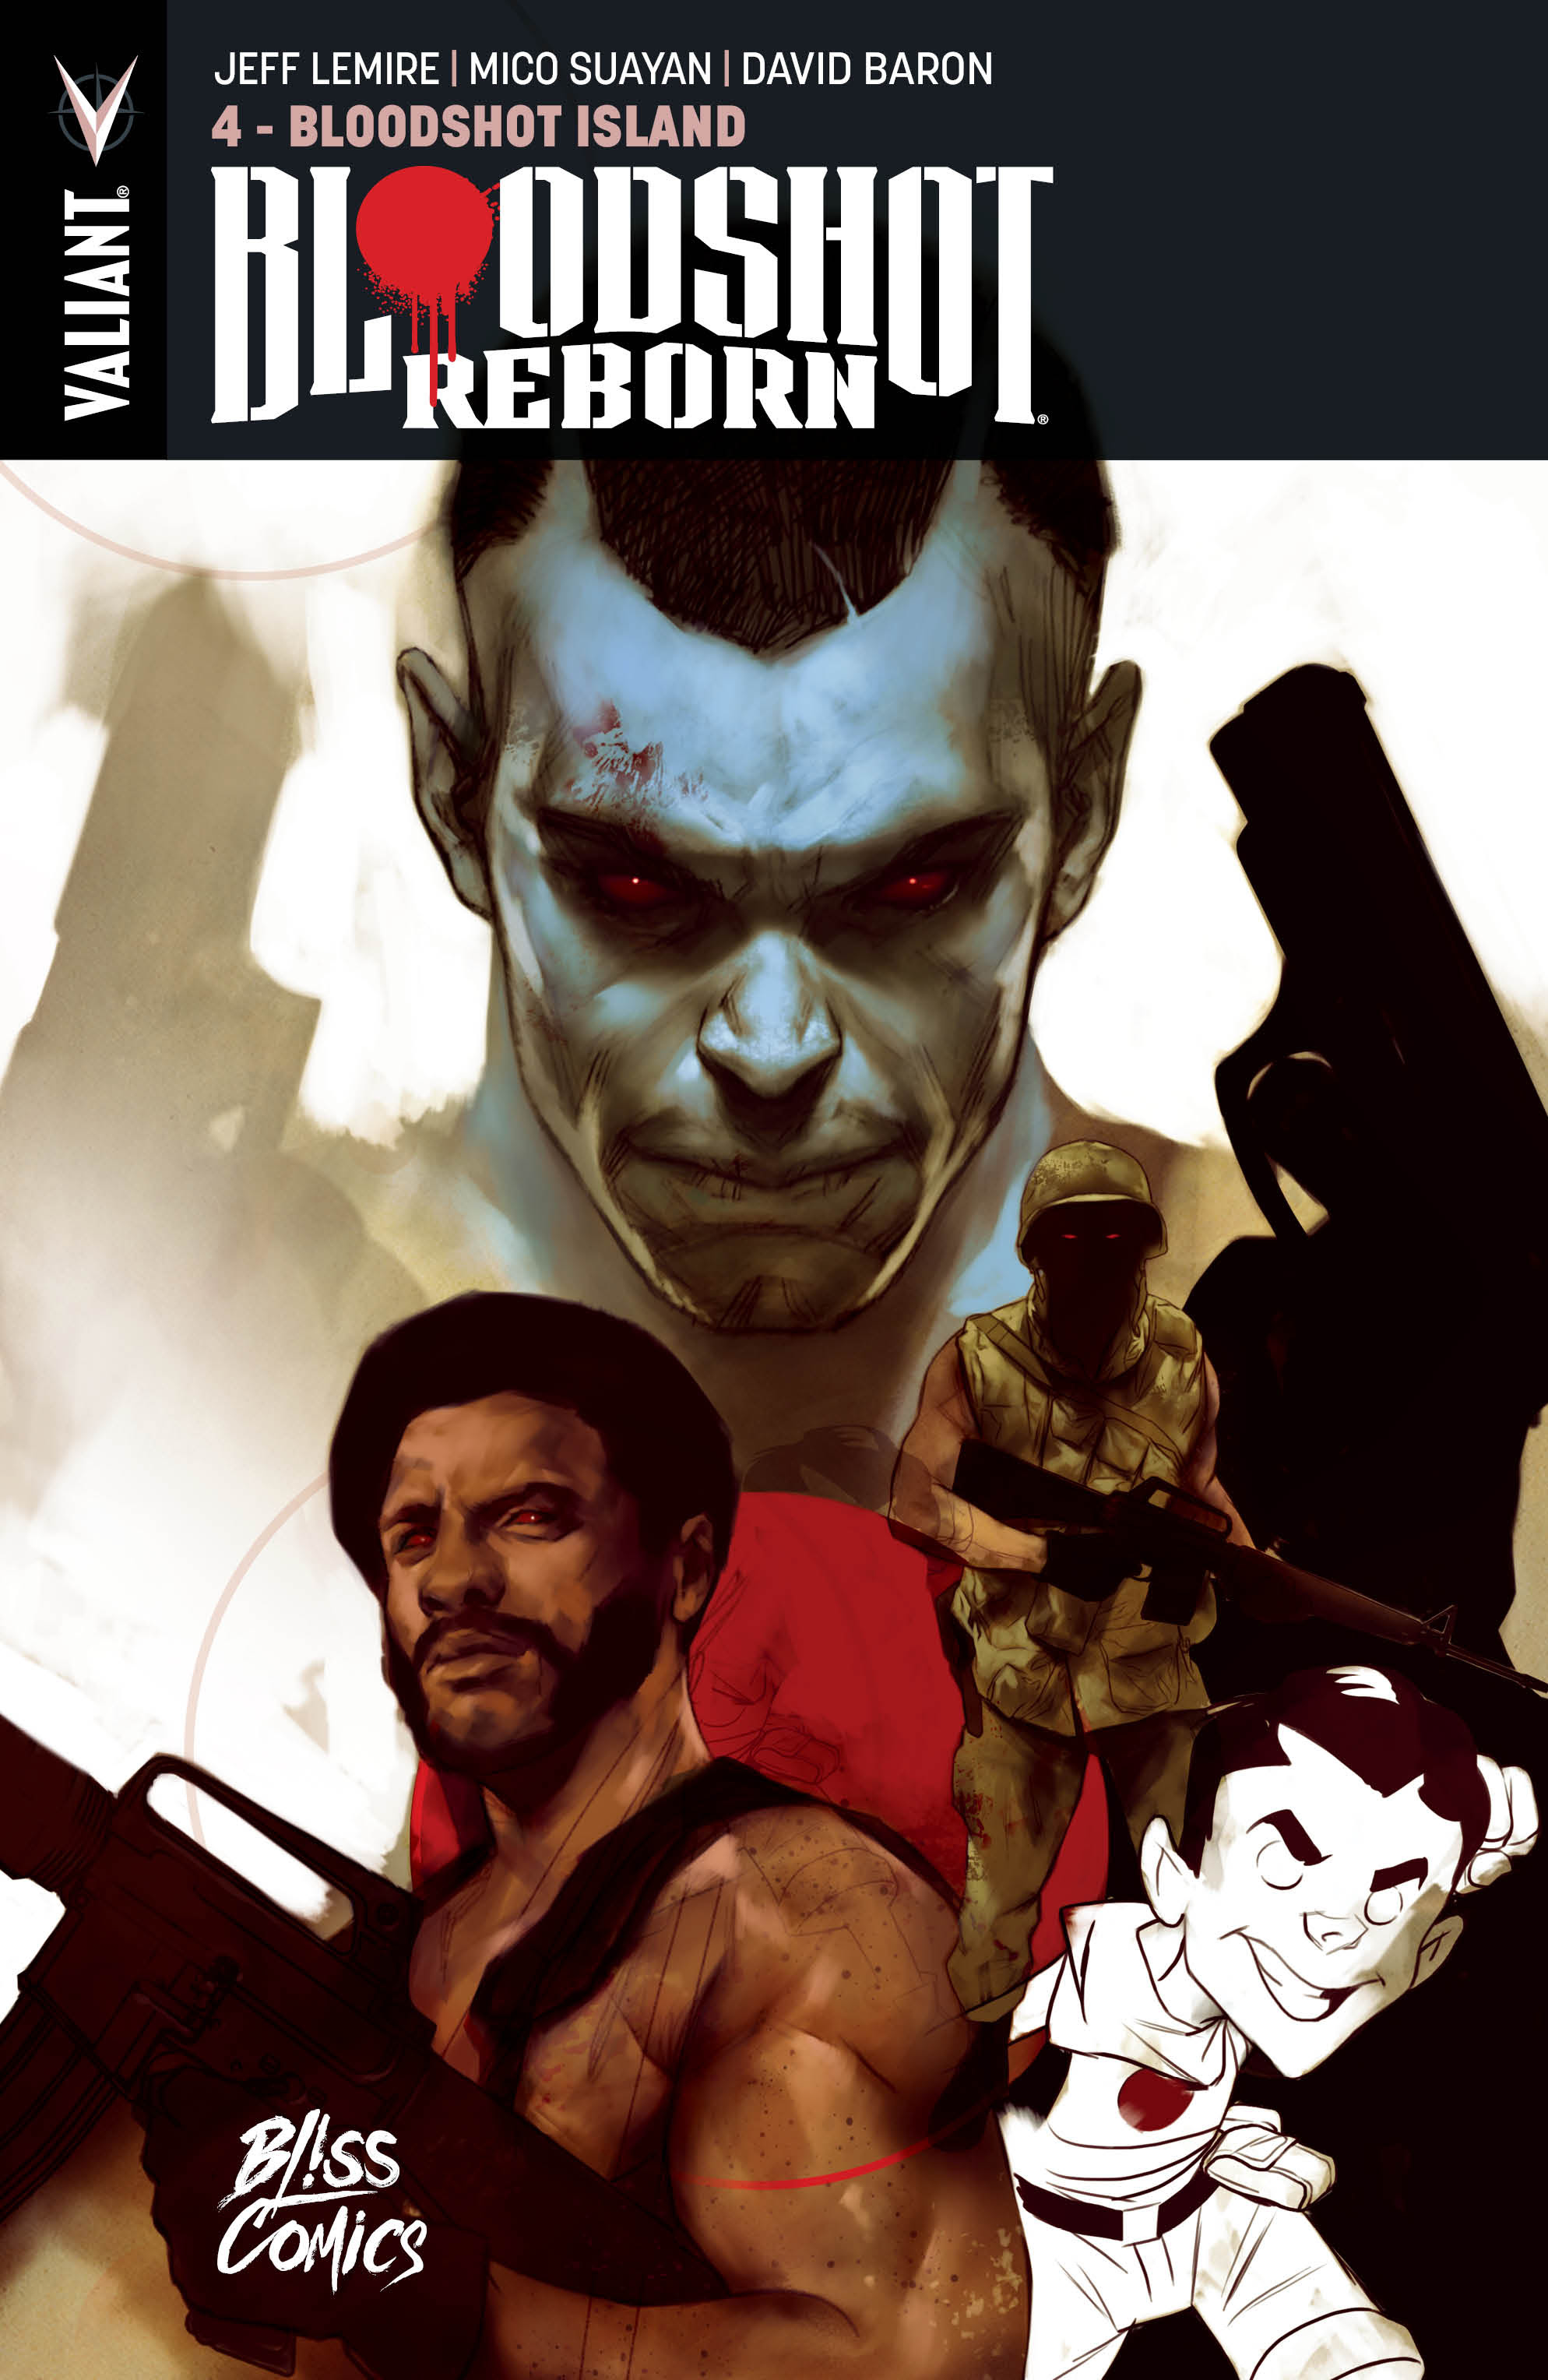 Bloodshot Reborn Tome 4 : Bloodshot Island